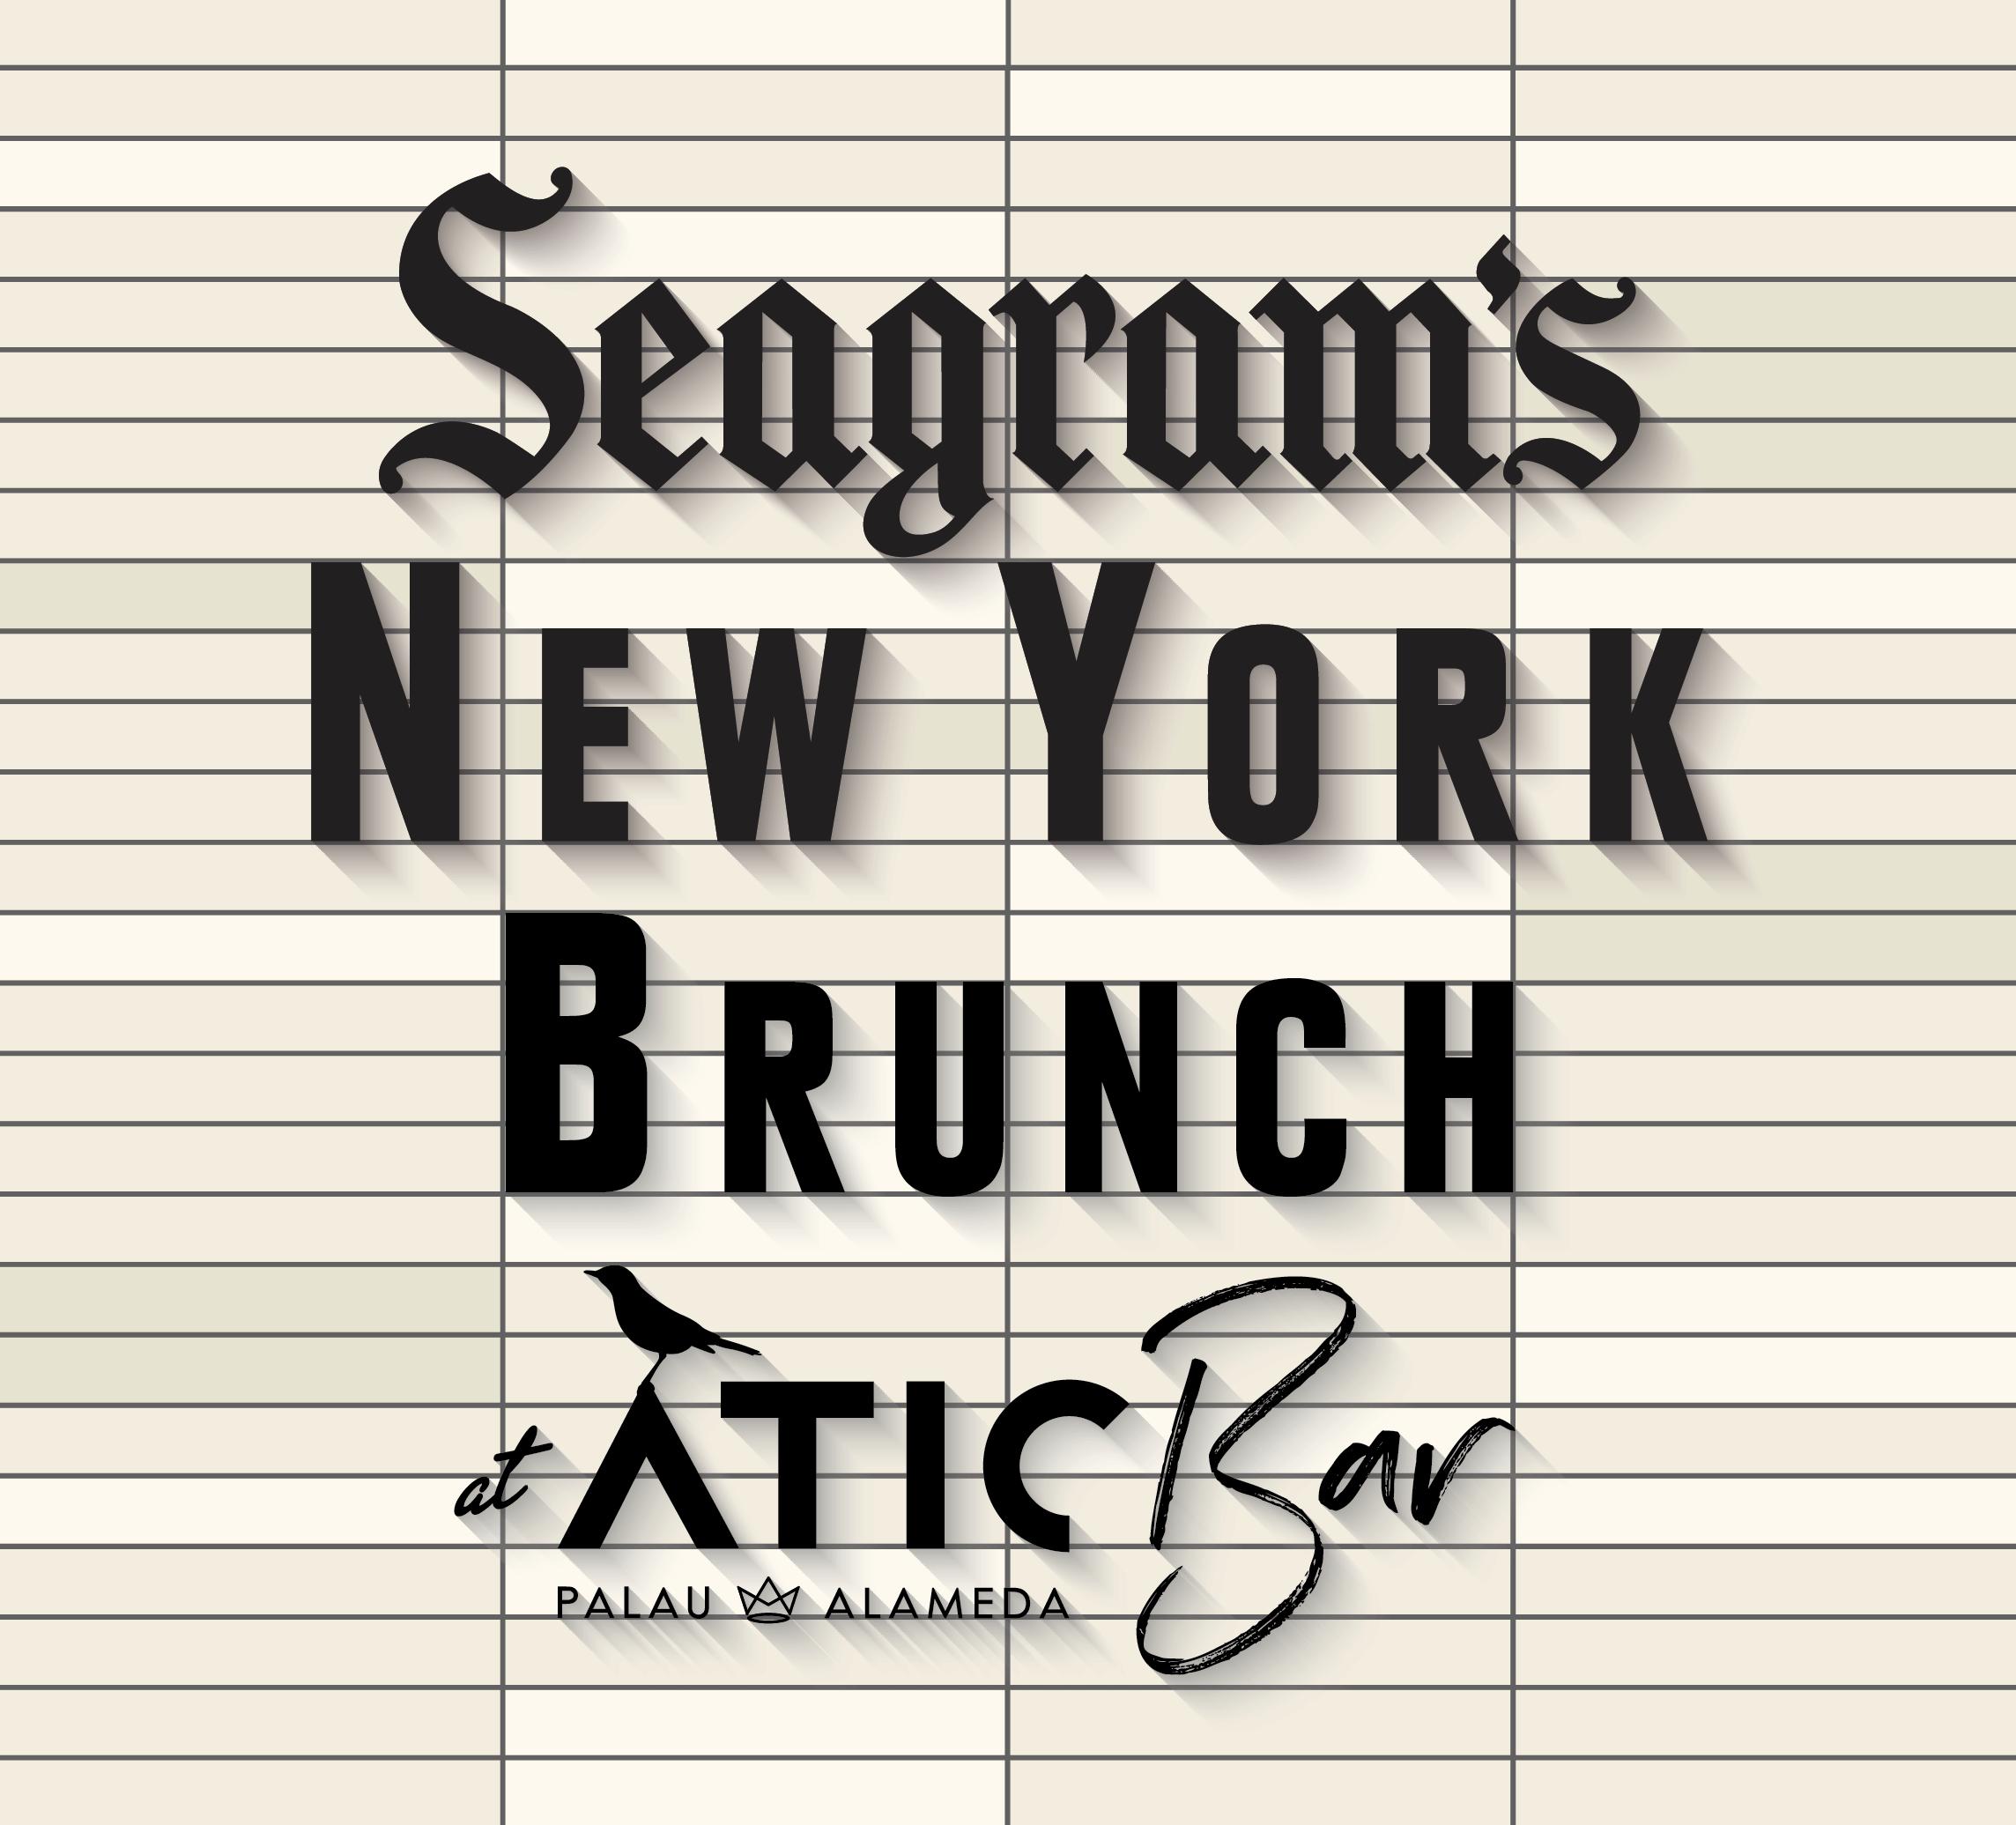 seagrams new york brunch valencia